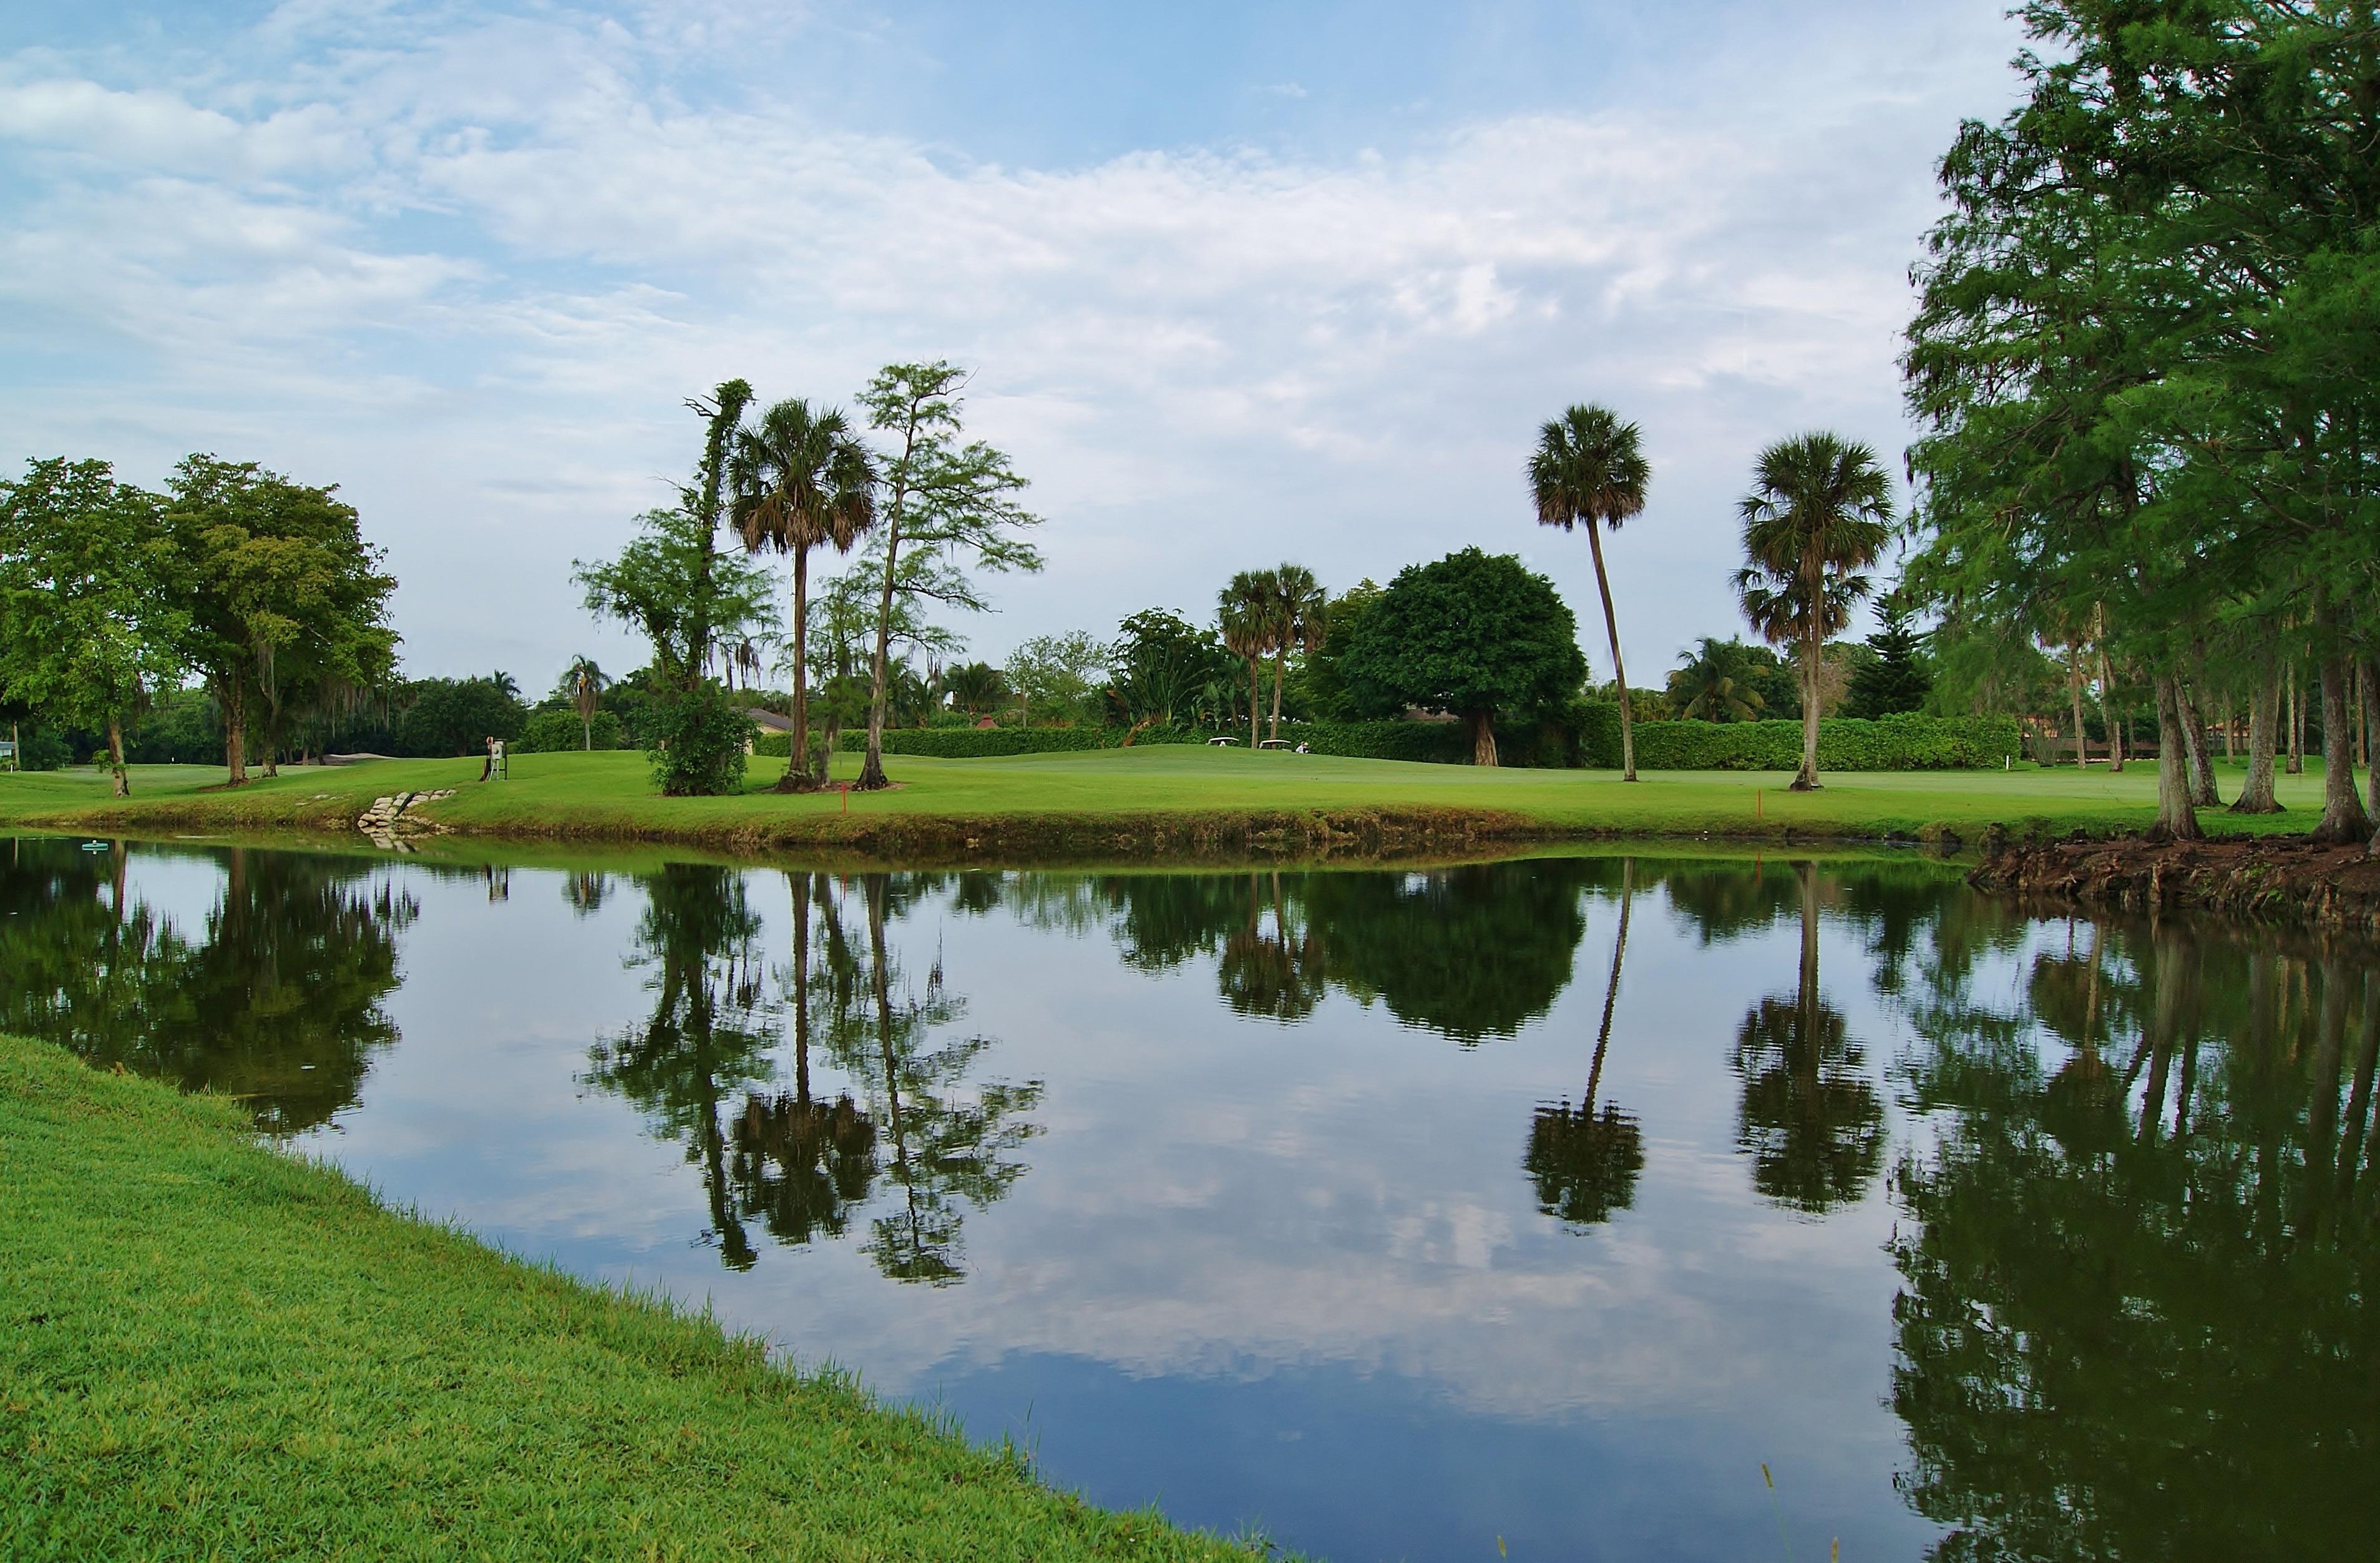 Tamarac, Florida, USA